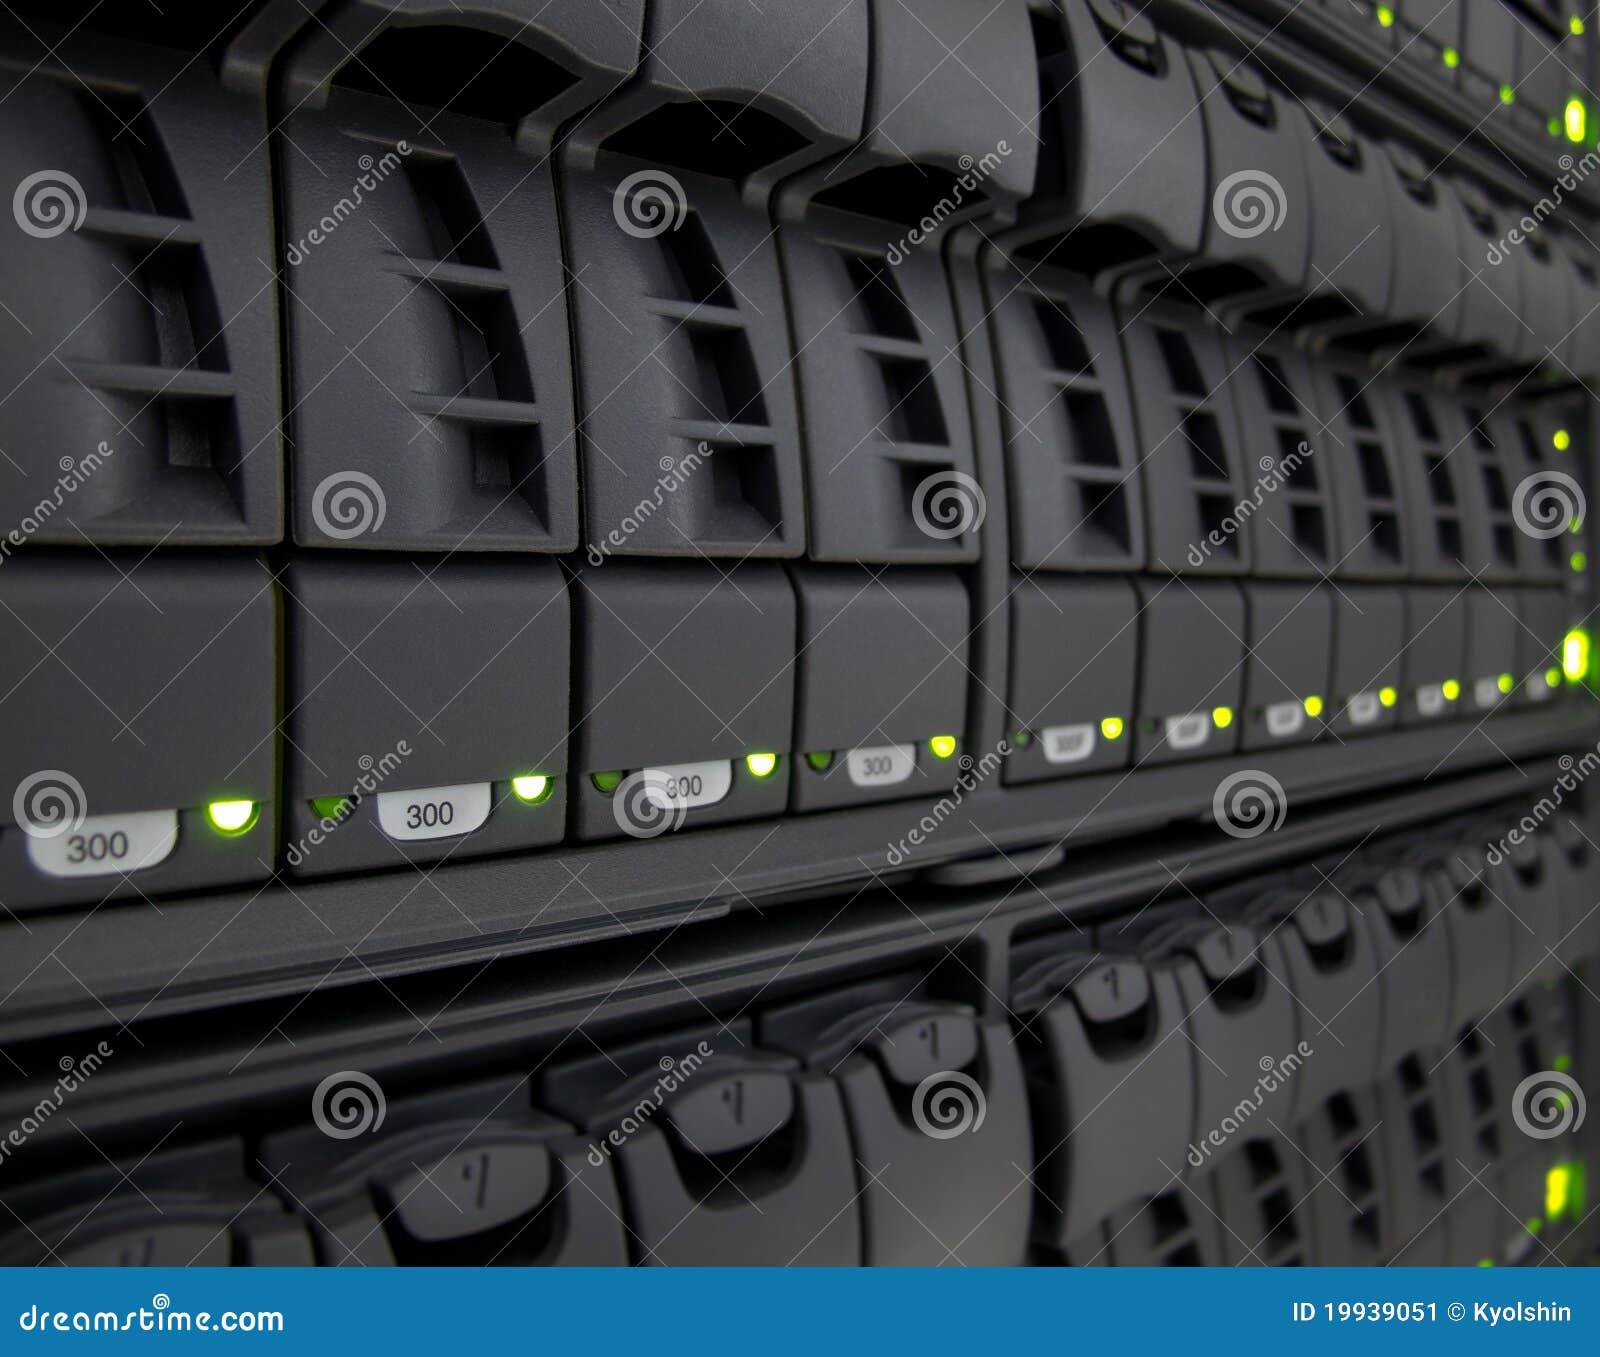 Speichersystem